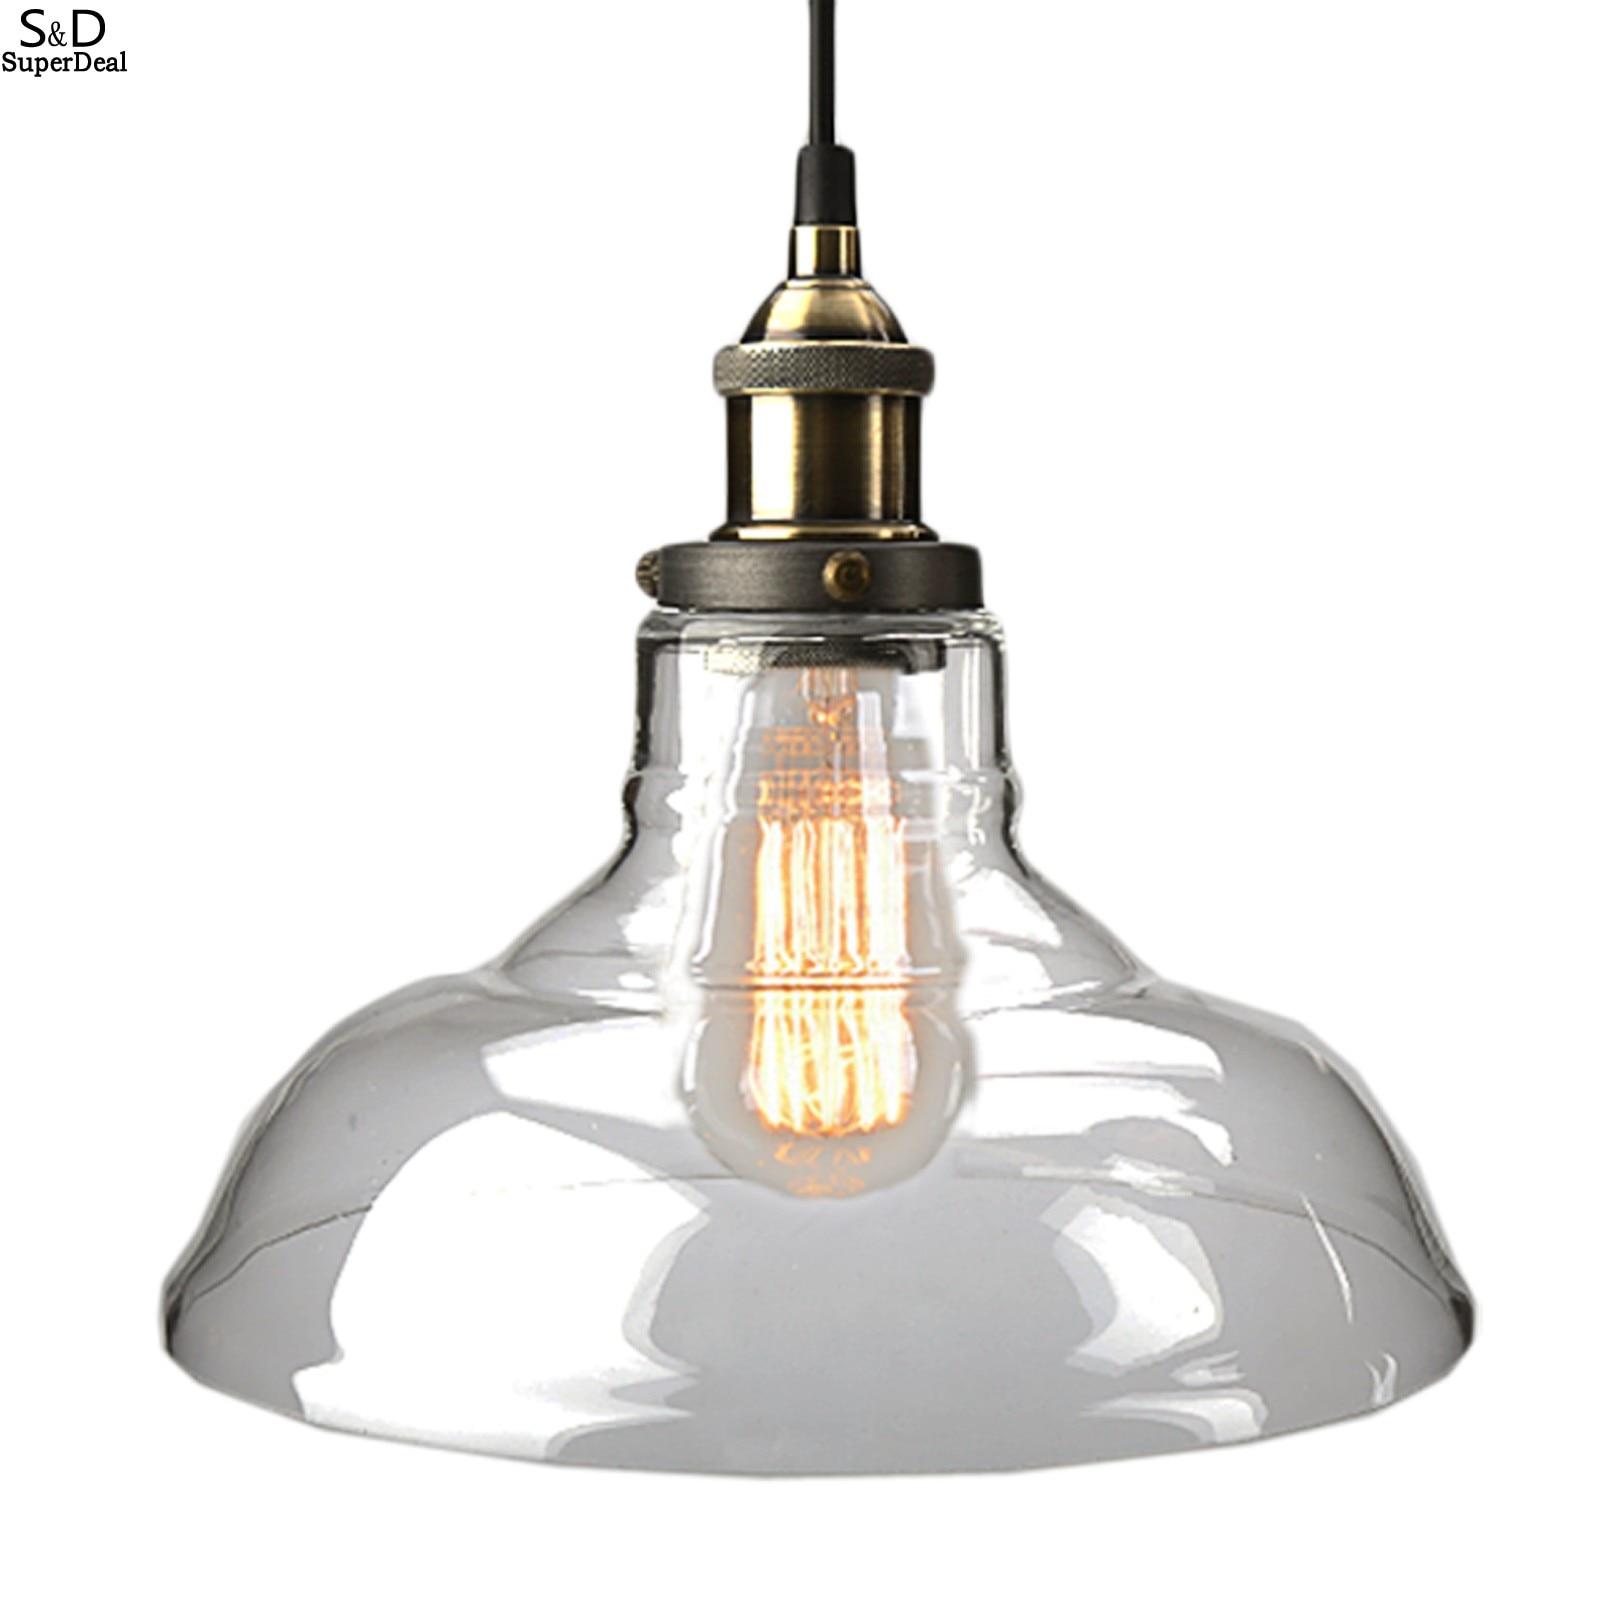 Loft American Vintage Pendant Lights Copper Lamp Holder Antique Pendant Lamp for Home Decor Restaurant Light With Light Bulb<br><br>Aliexpress